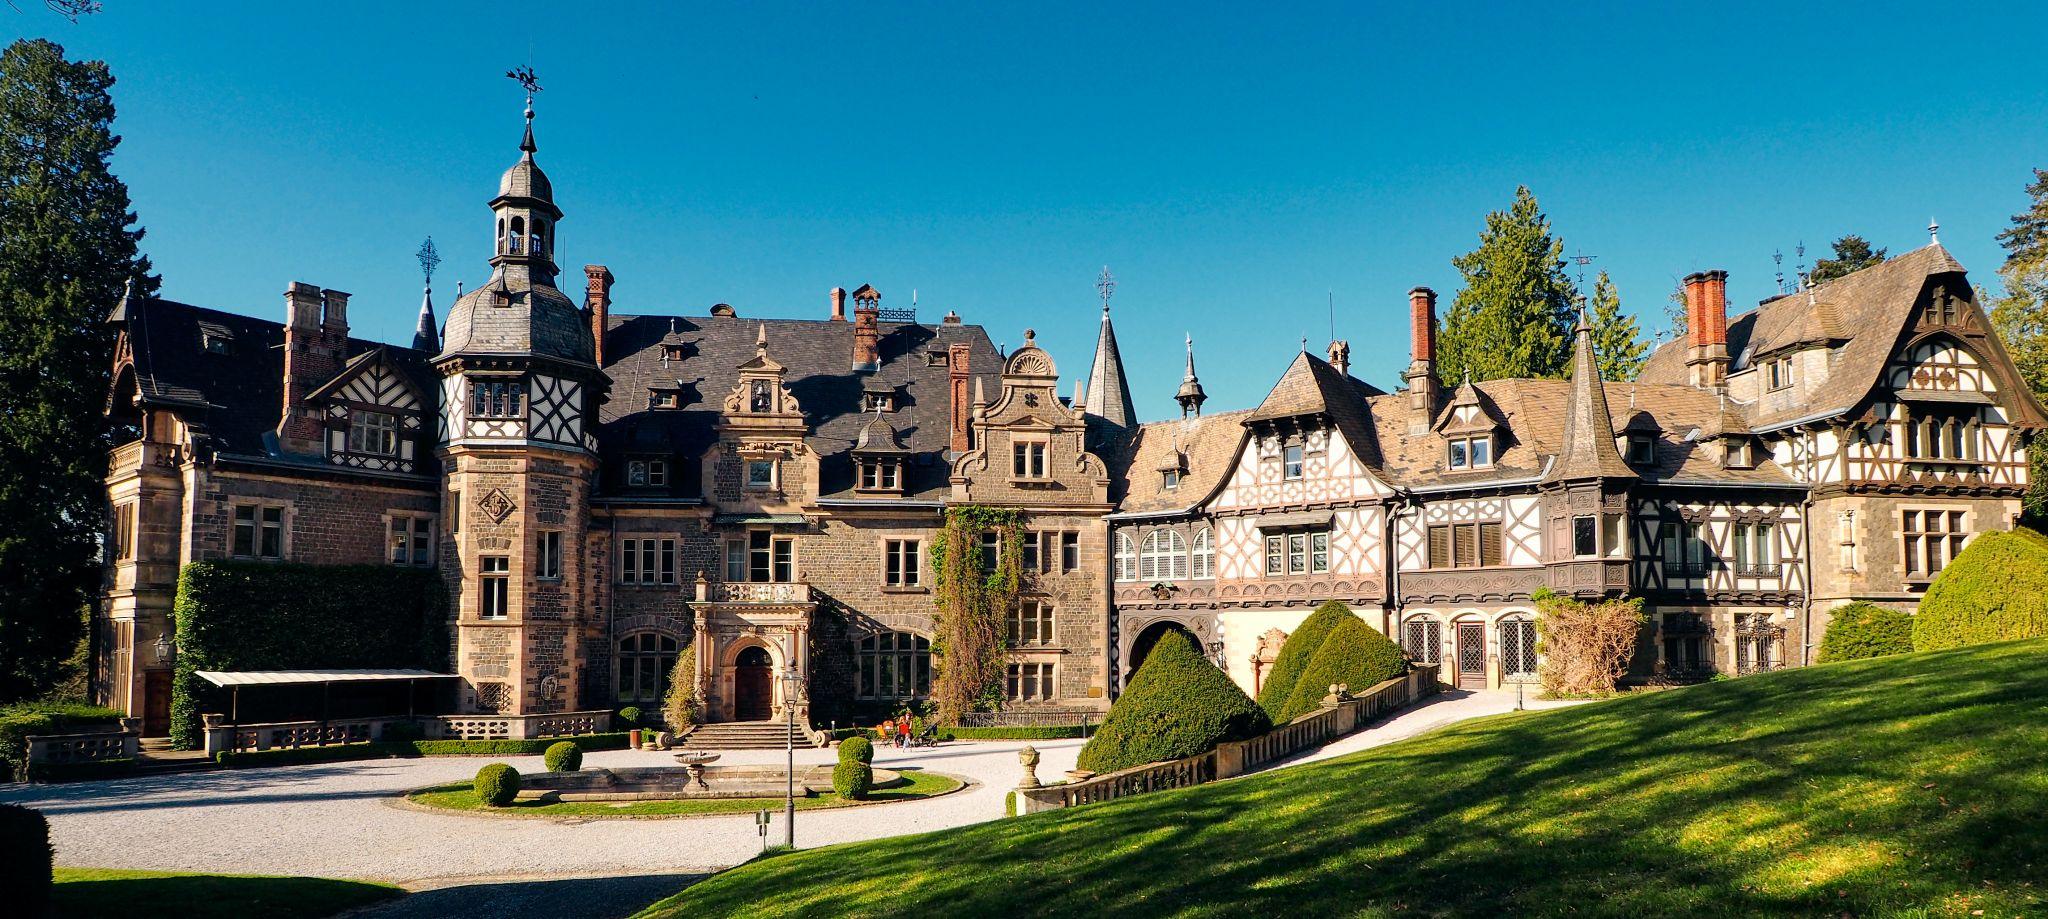 Rauischholzhausen Castle, Germany